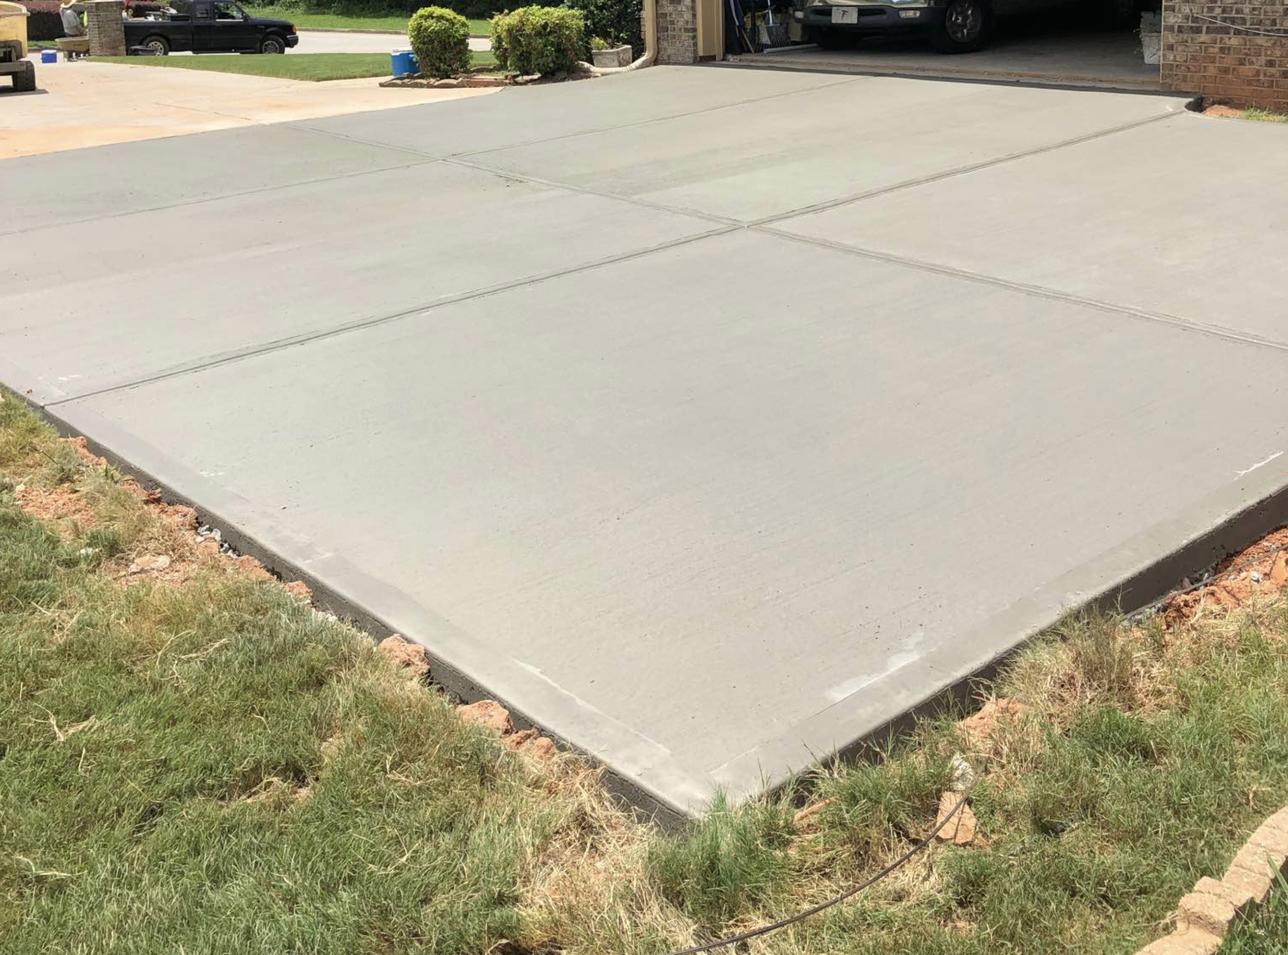 this image shows patio in Fullerton, California